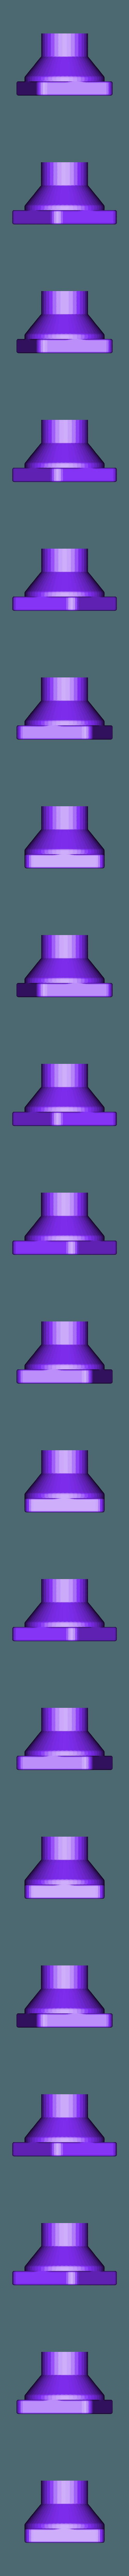 FILTER-INTERFACE RIGHT(1).stl Download free STL file Mask connector Drager Ambu  • 3D printer model, rprzekop